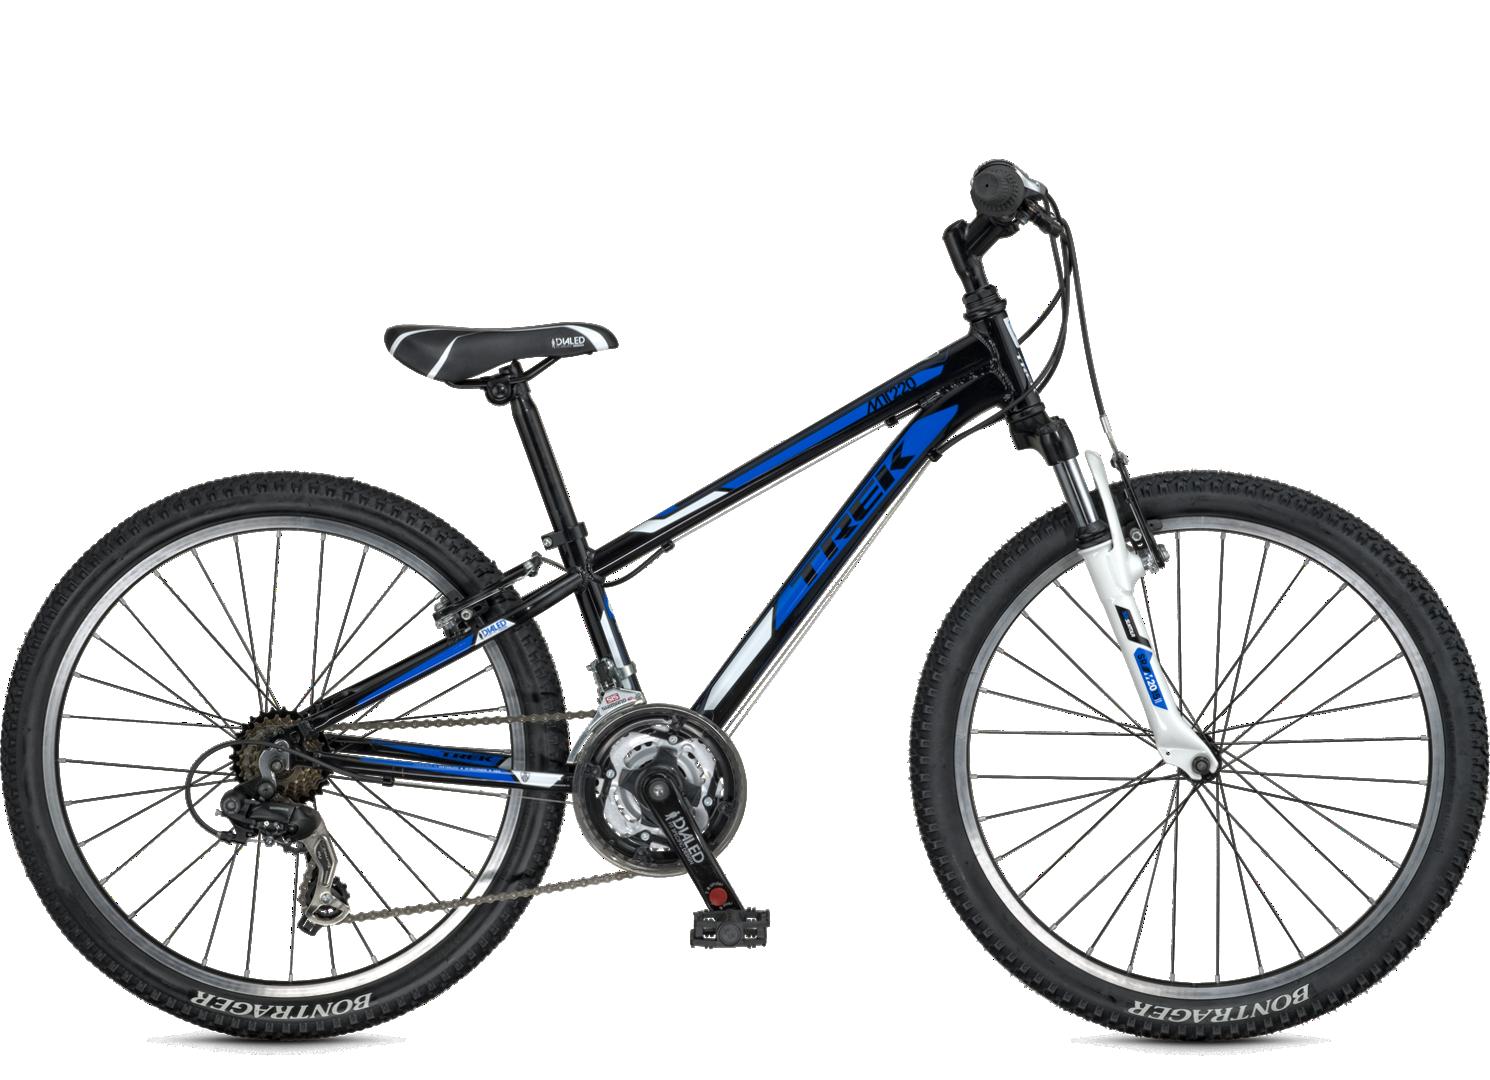 2013 MT 220 Boy's - Bike Archive - Trek Bicycle